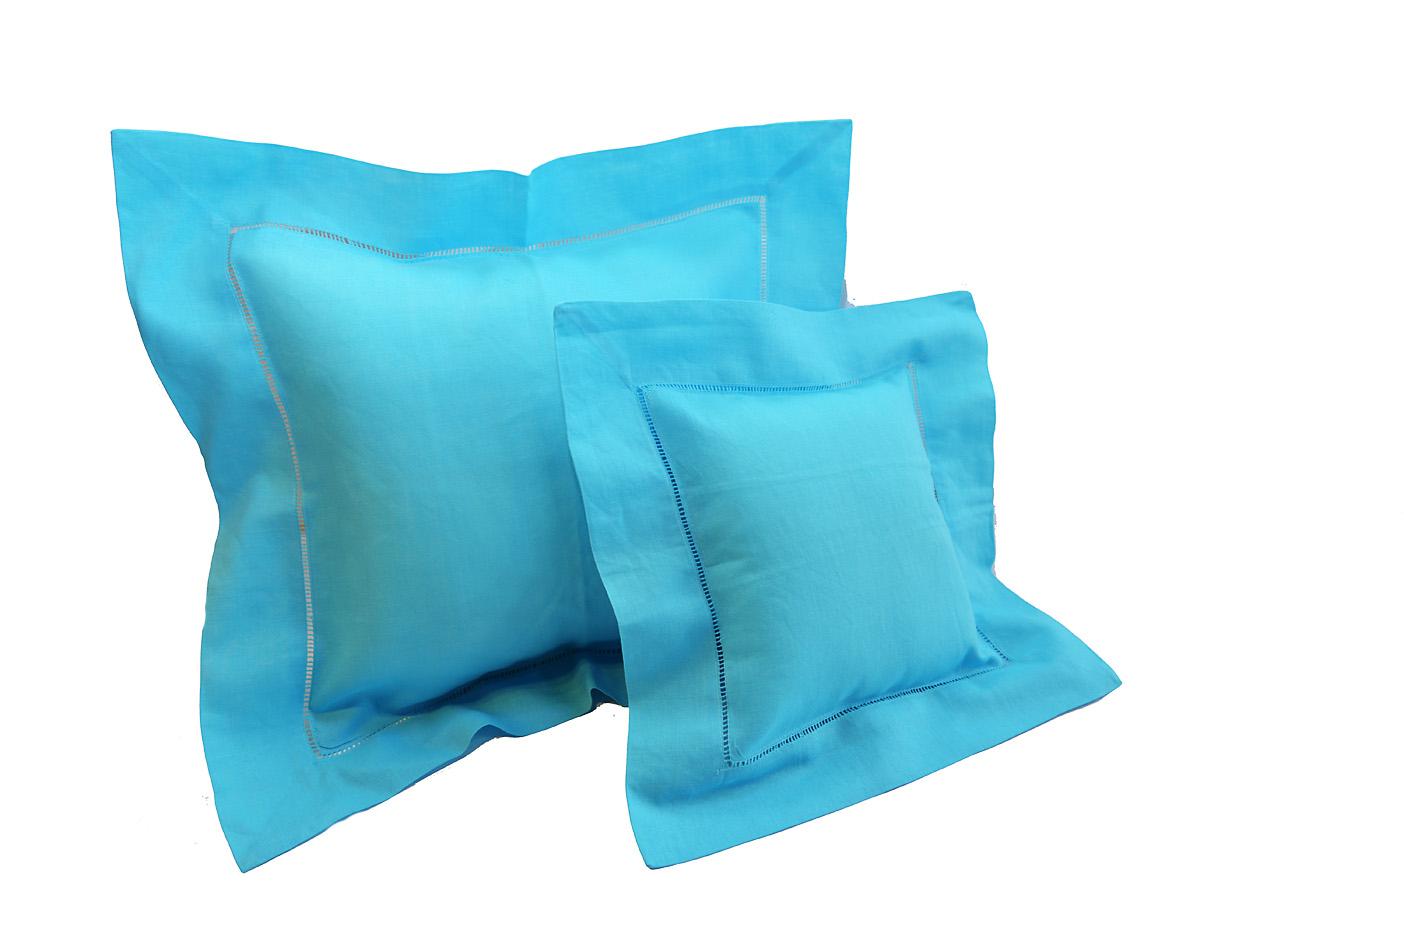 Baby pillow. Aqua colored